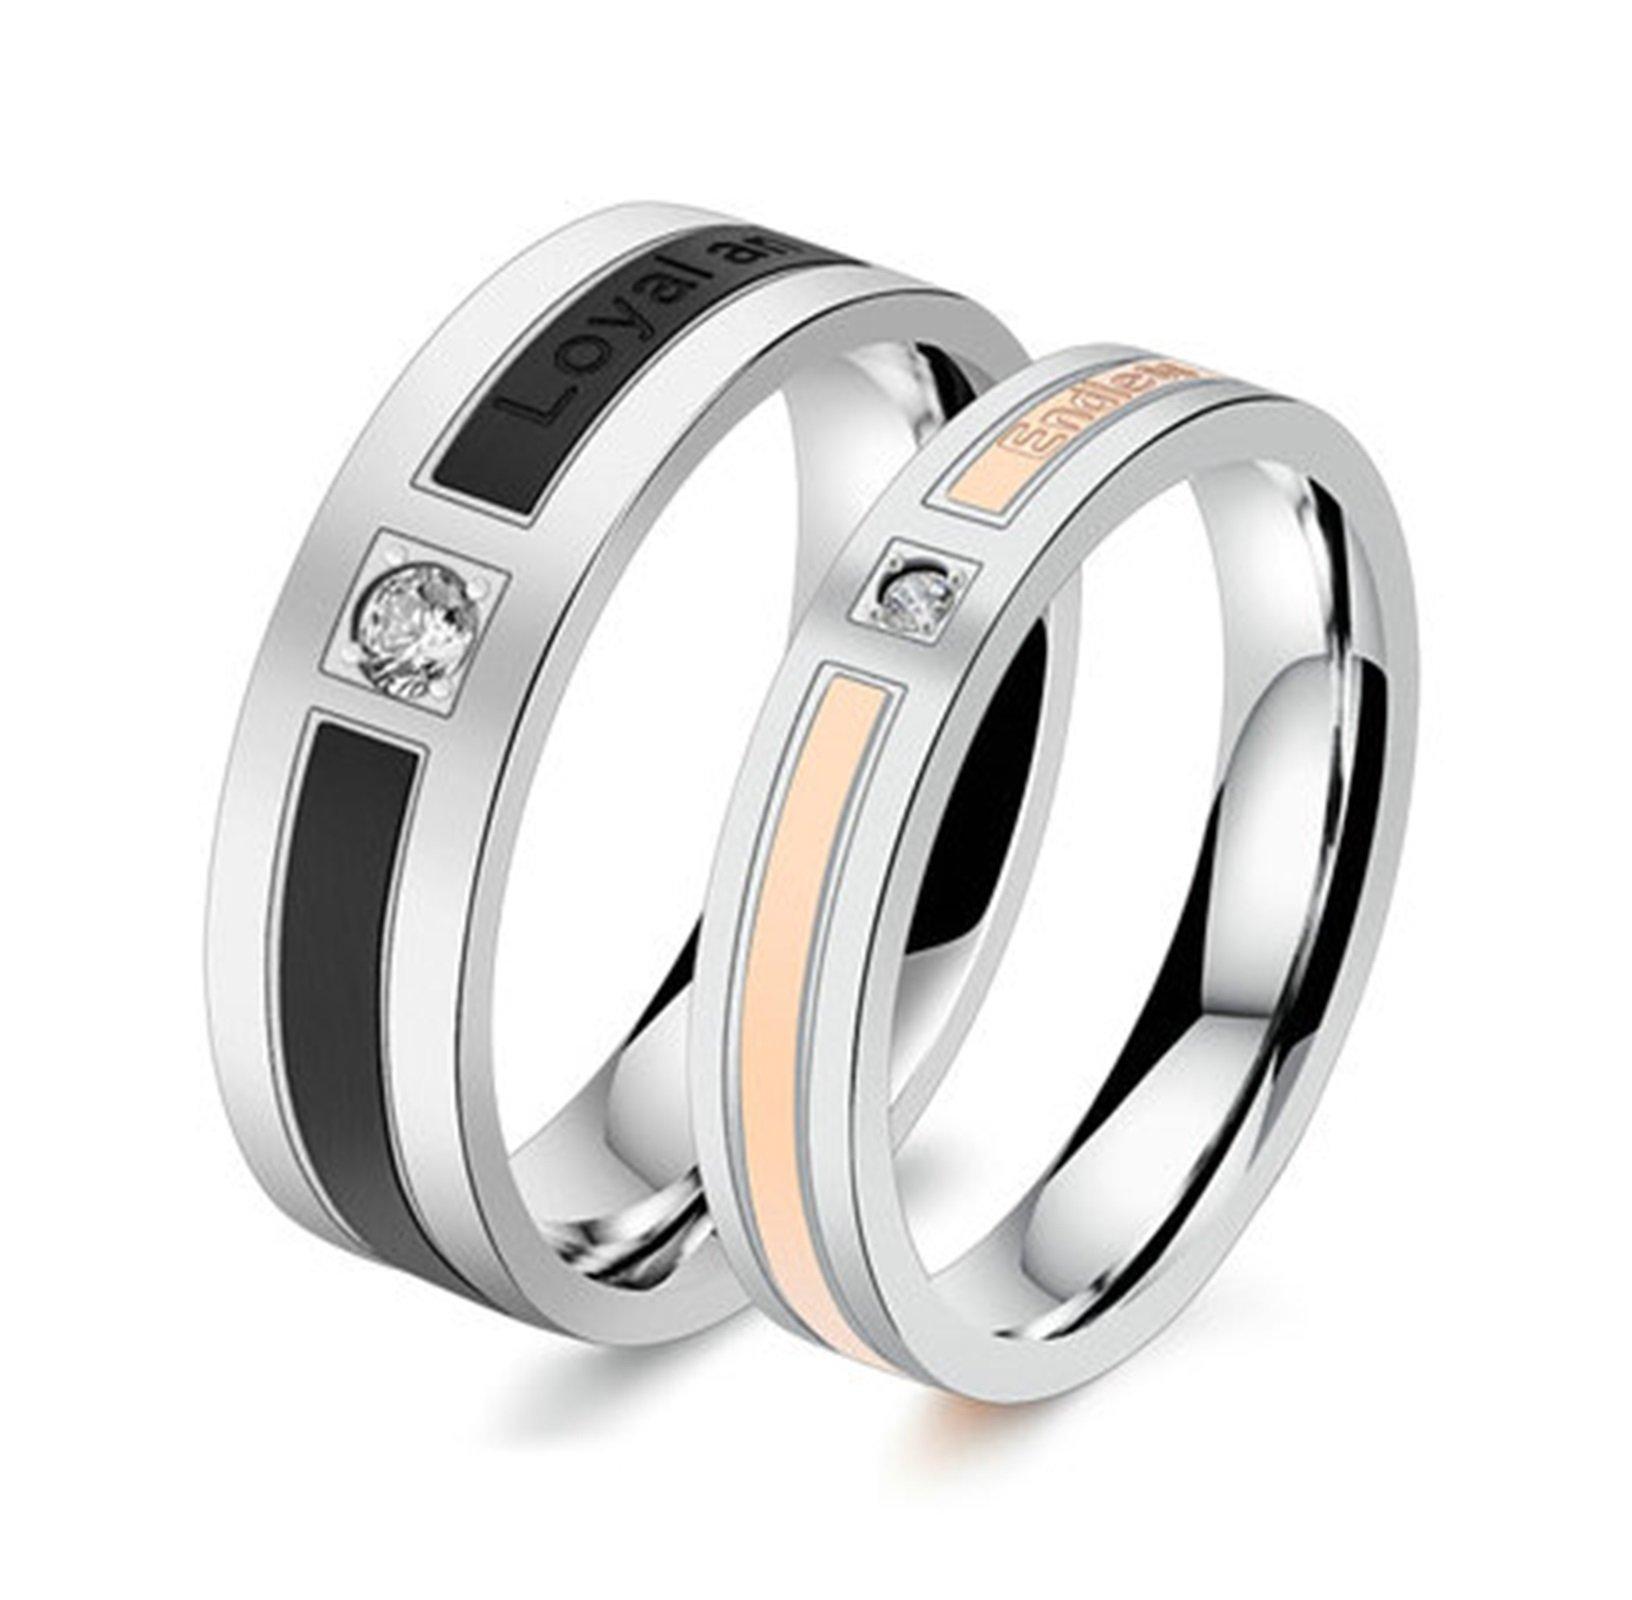 Beydodo 1PCS Stainless Steel Ring 8 Cubic Zirconia 6MM Width Wedding Rings Mens Love Ring Band by Beydodo